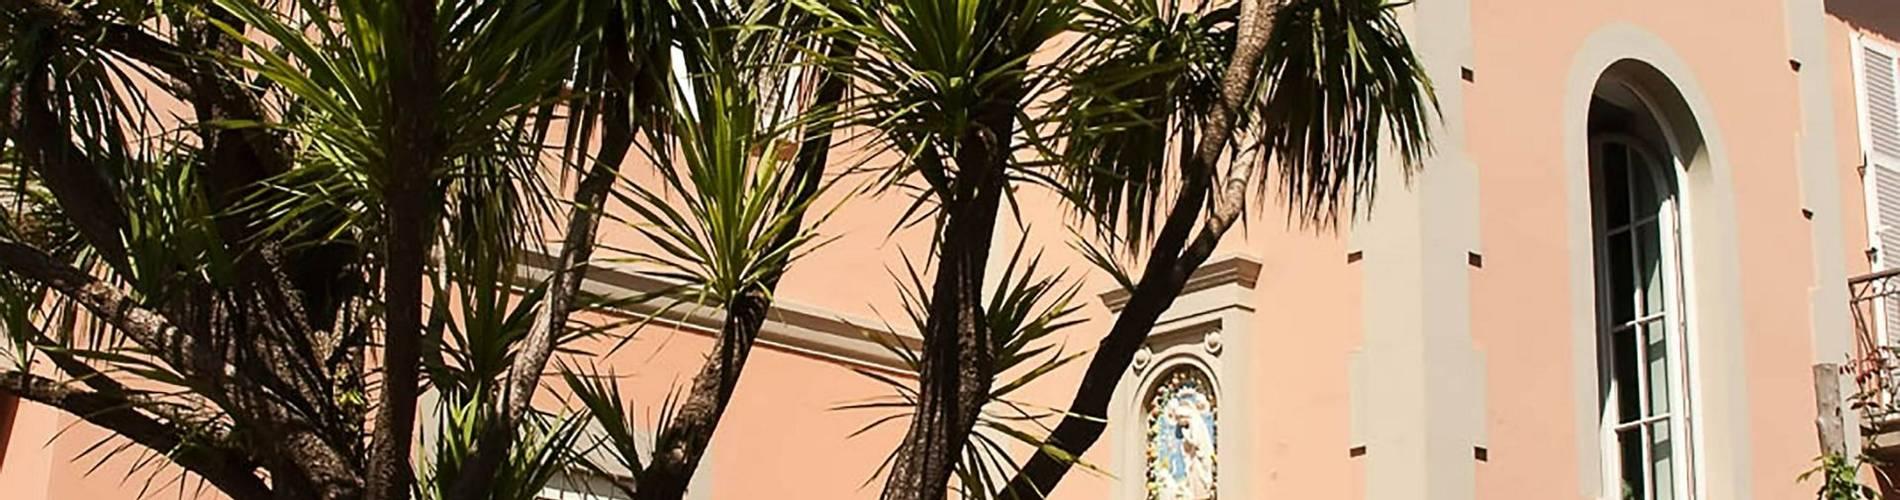 Villa Maria, Amalfi Coast, Italy.jpg